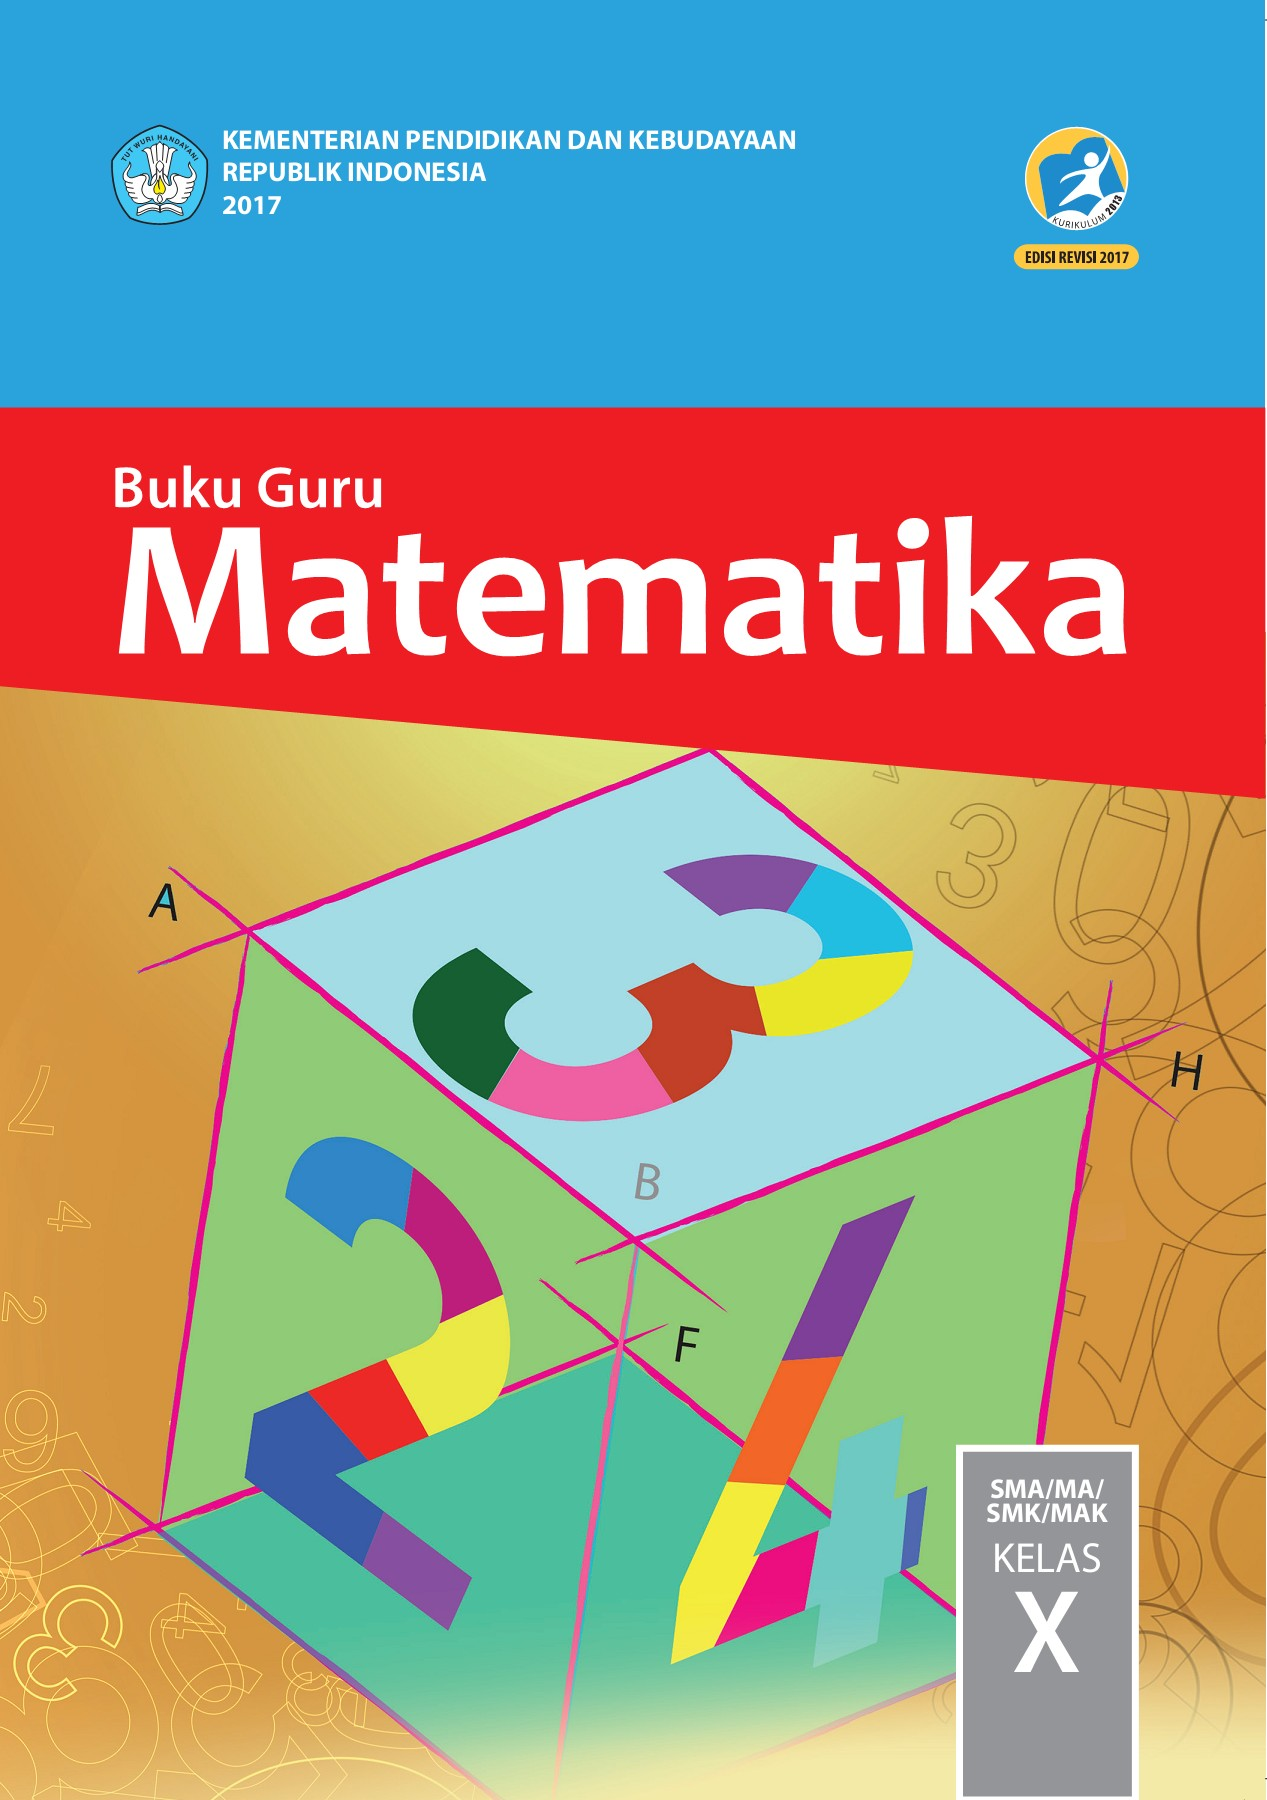 Matematika Buku Guru Kelas X Flip Book Pages 1 50